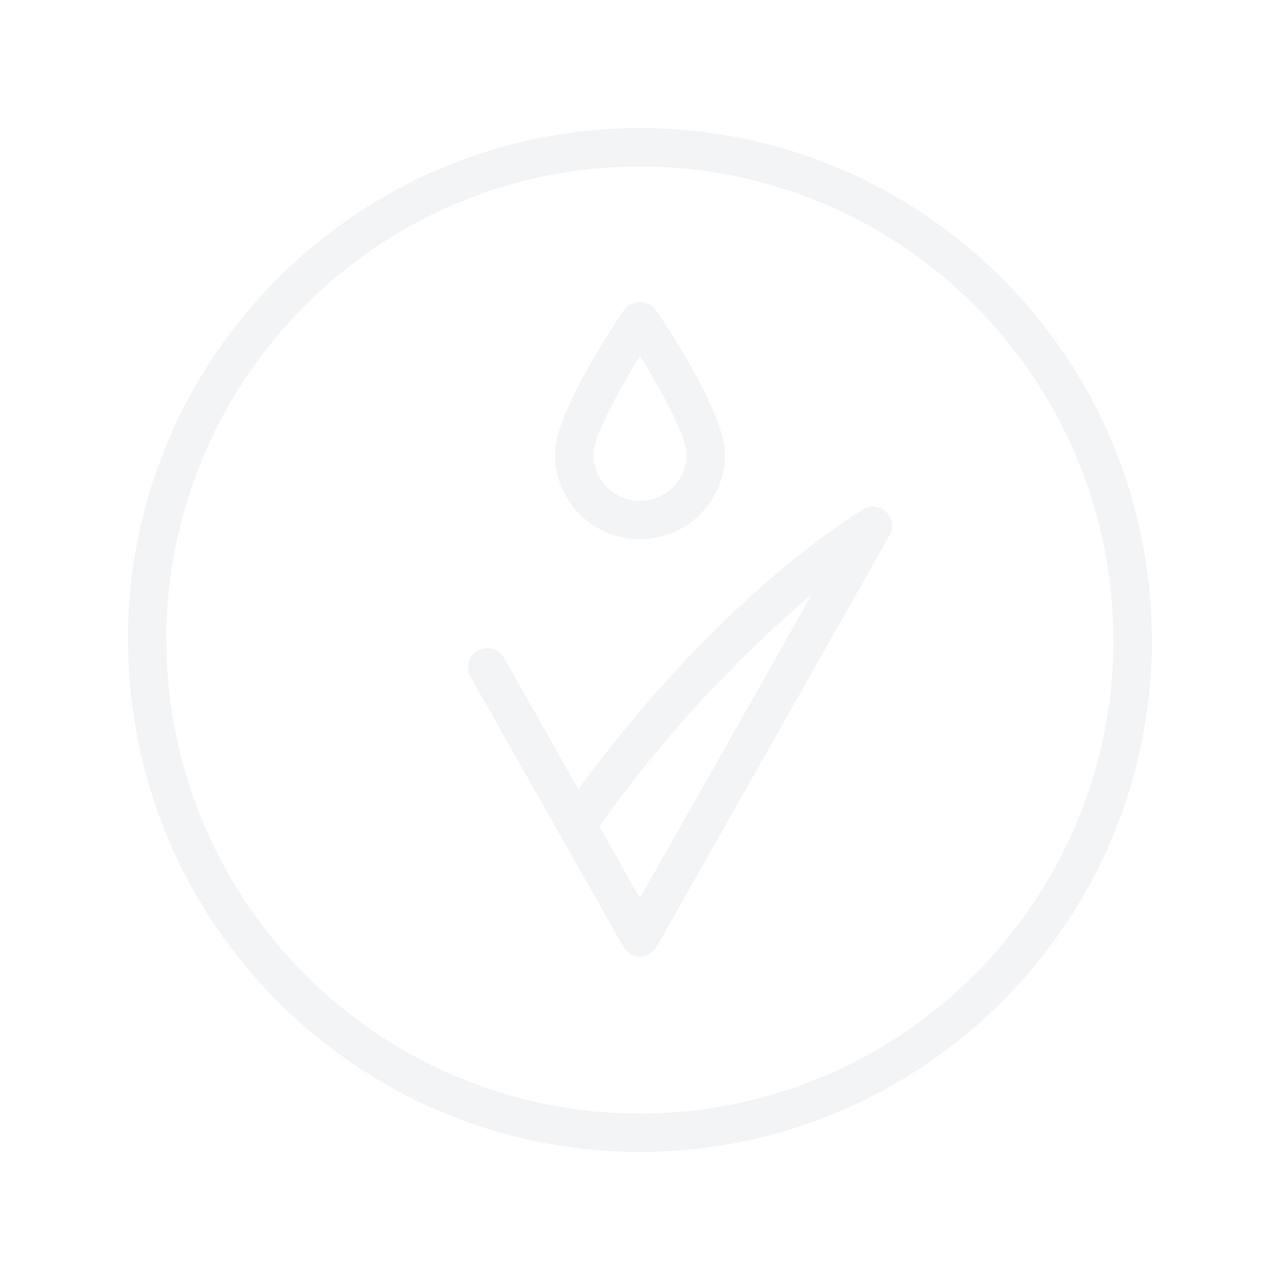 Tweezerman Professional Stainless Steel Fingernail Clipper